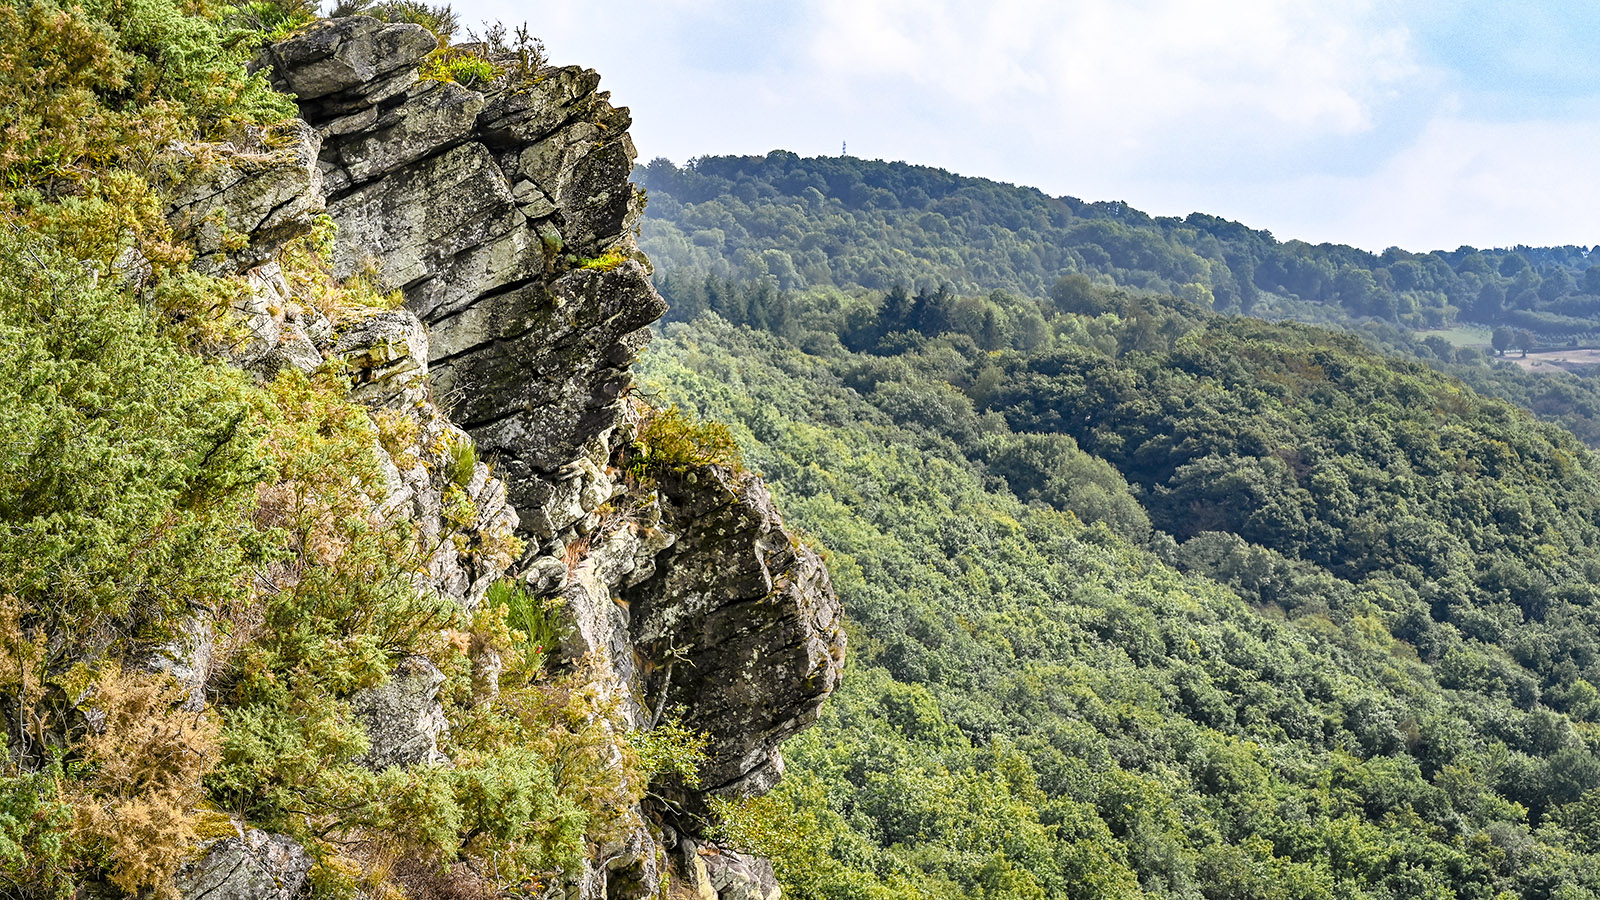 La face humaine - eine Felsformation der Roche d'Oëtre. Foto: Hilke Maunder